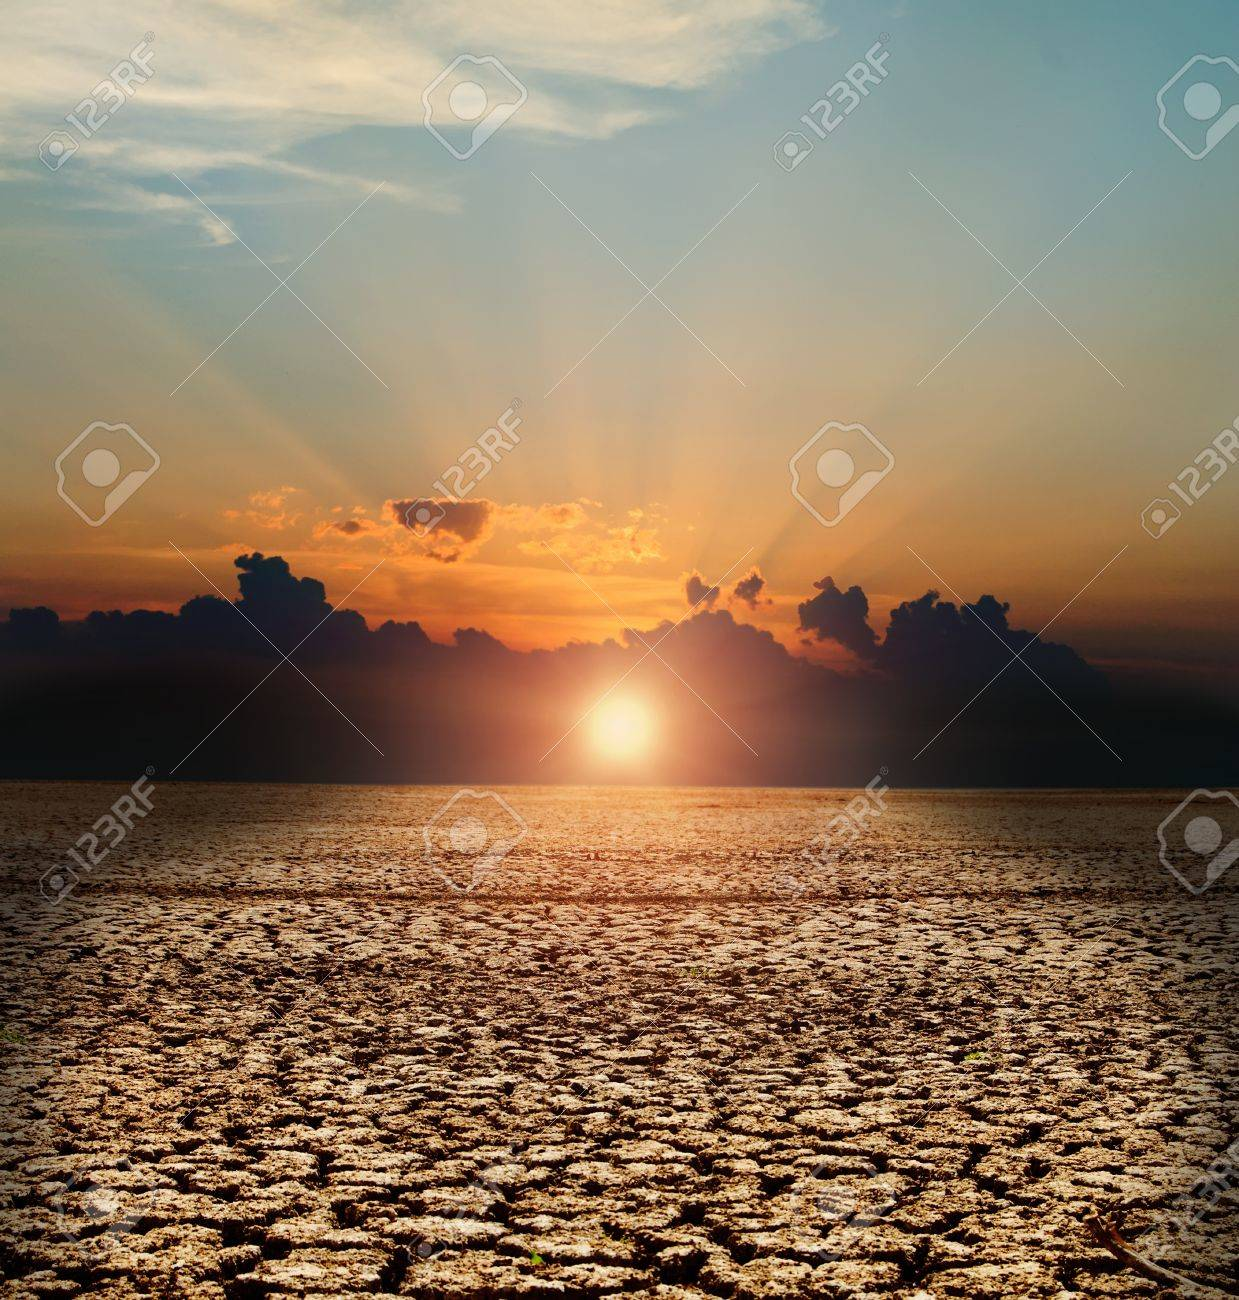 natural disaster. arid climate Stock Photo - 8525292